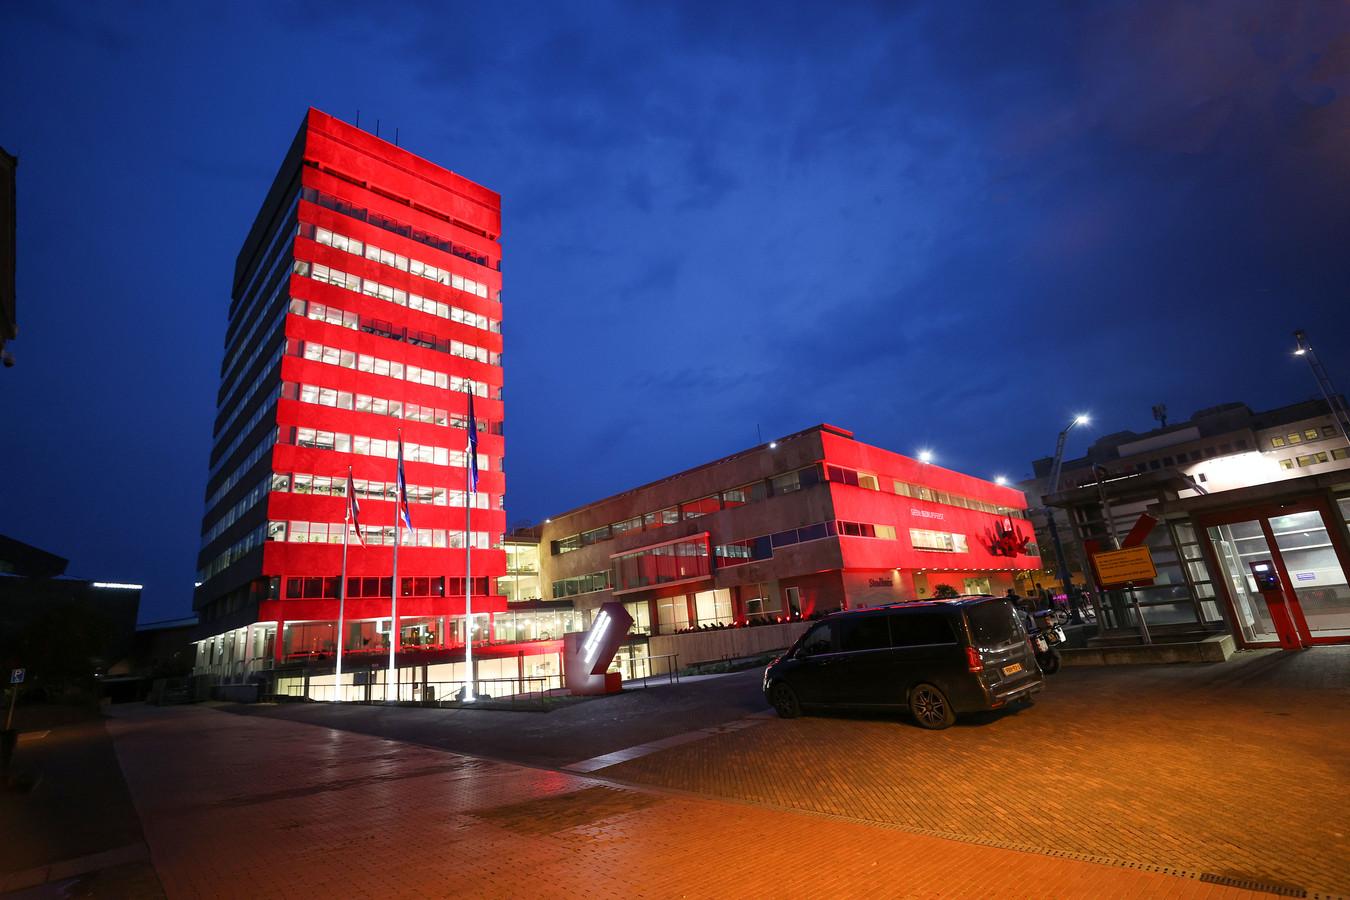 Het Eindhovense stadhuis.